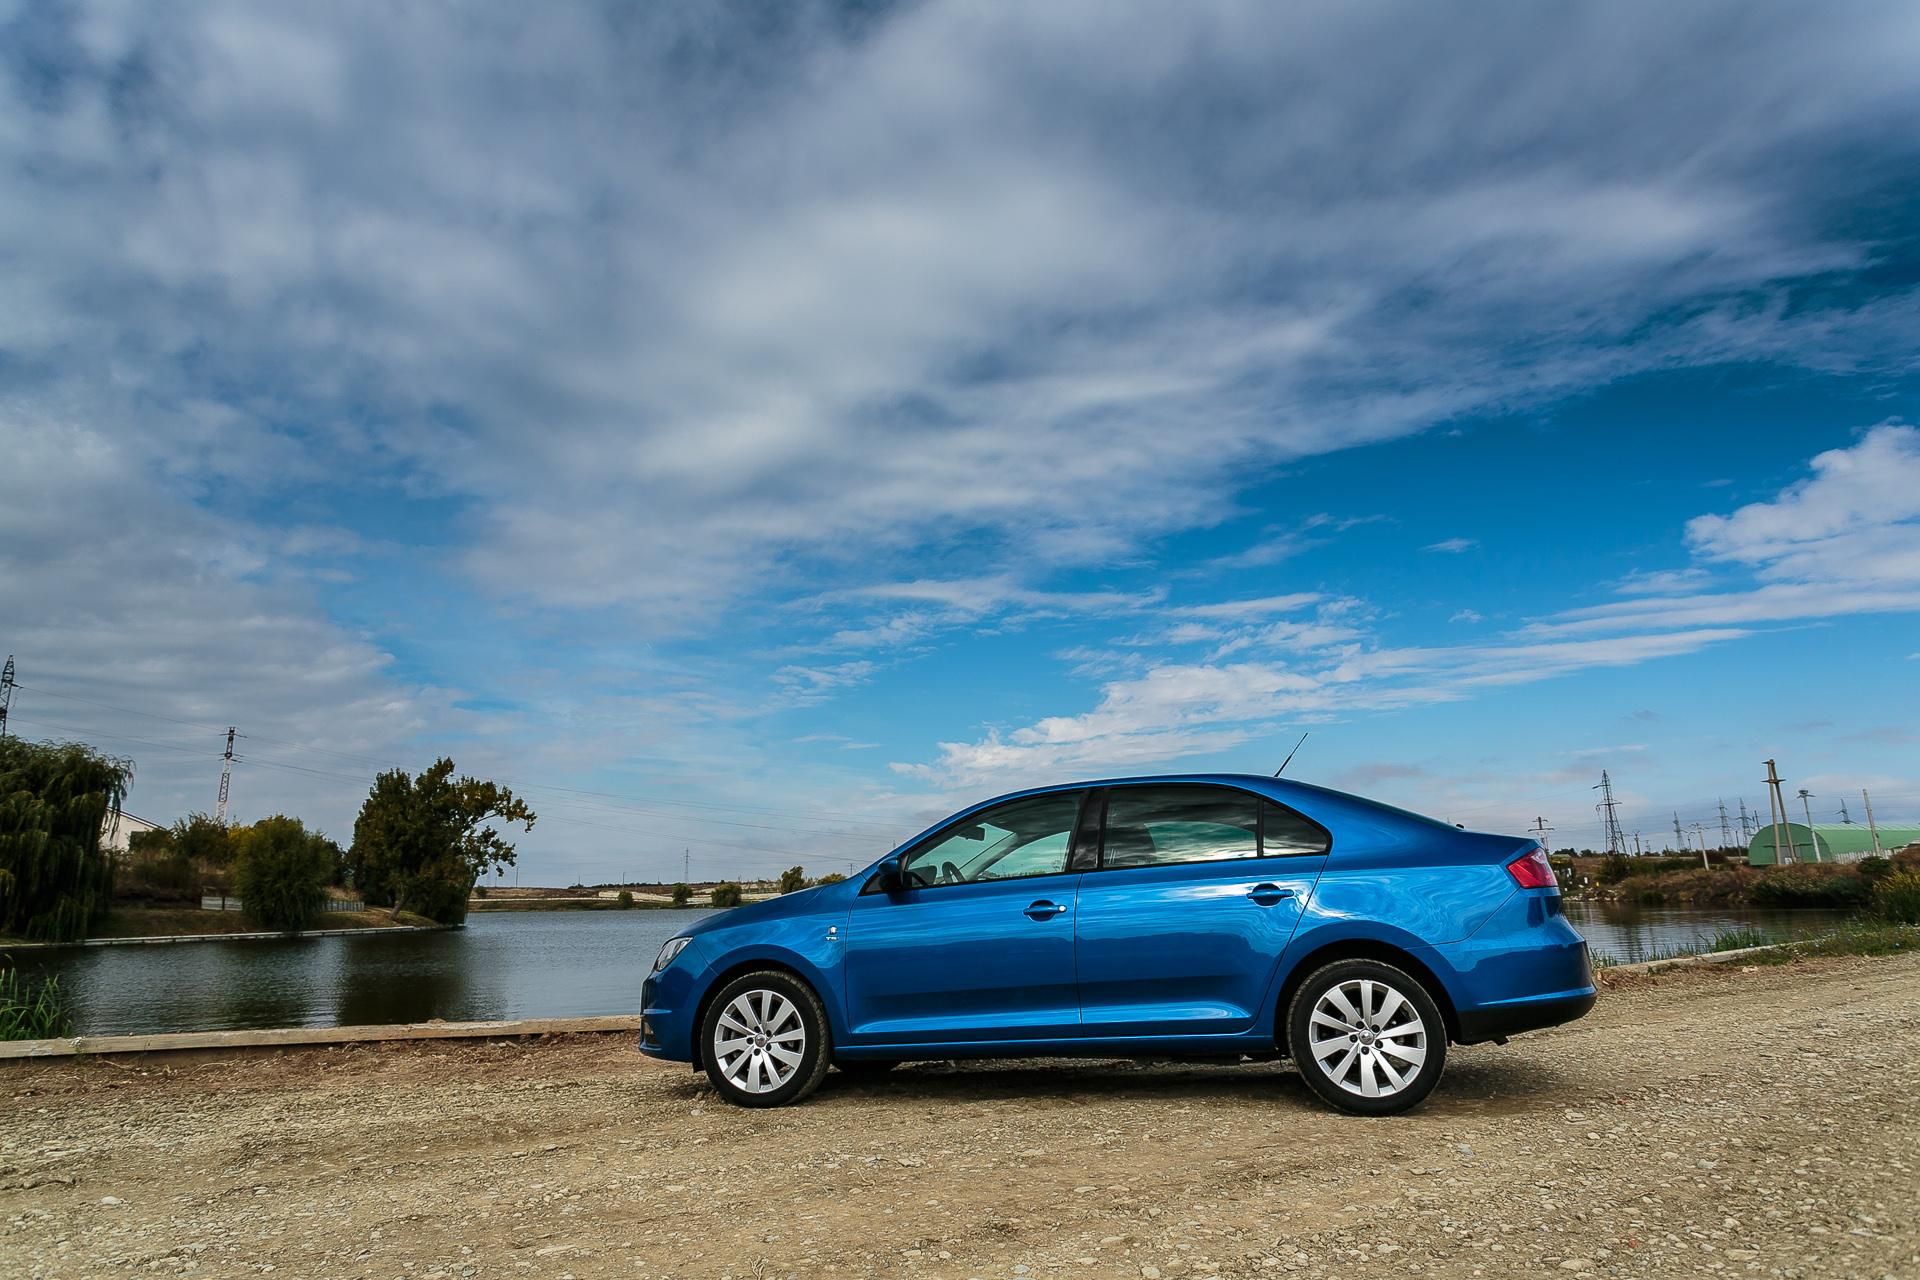 Drive test SEAT Toledo – 1.2 TSI -105 cp – Style